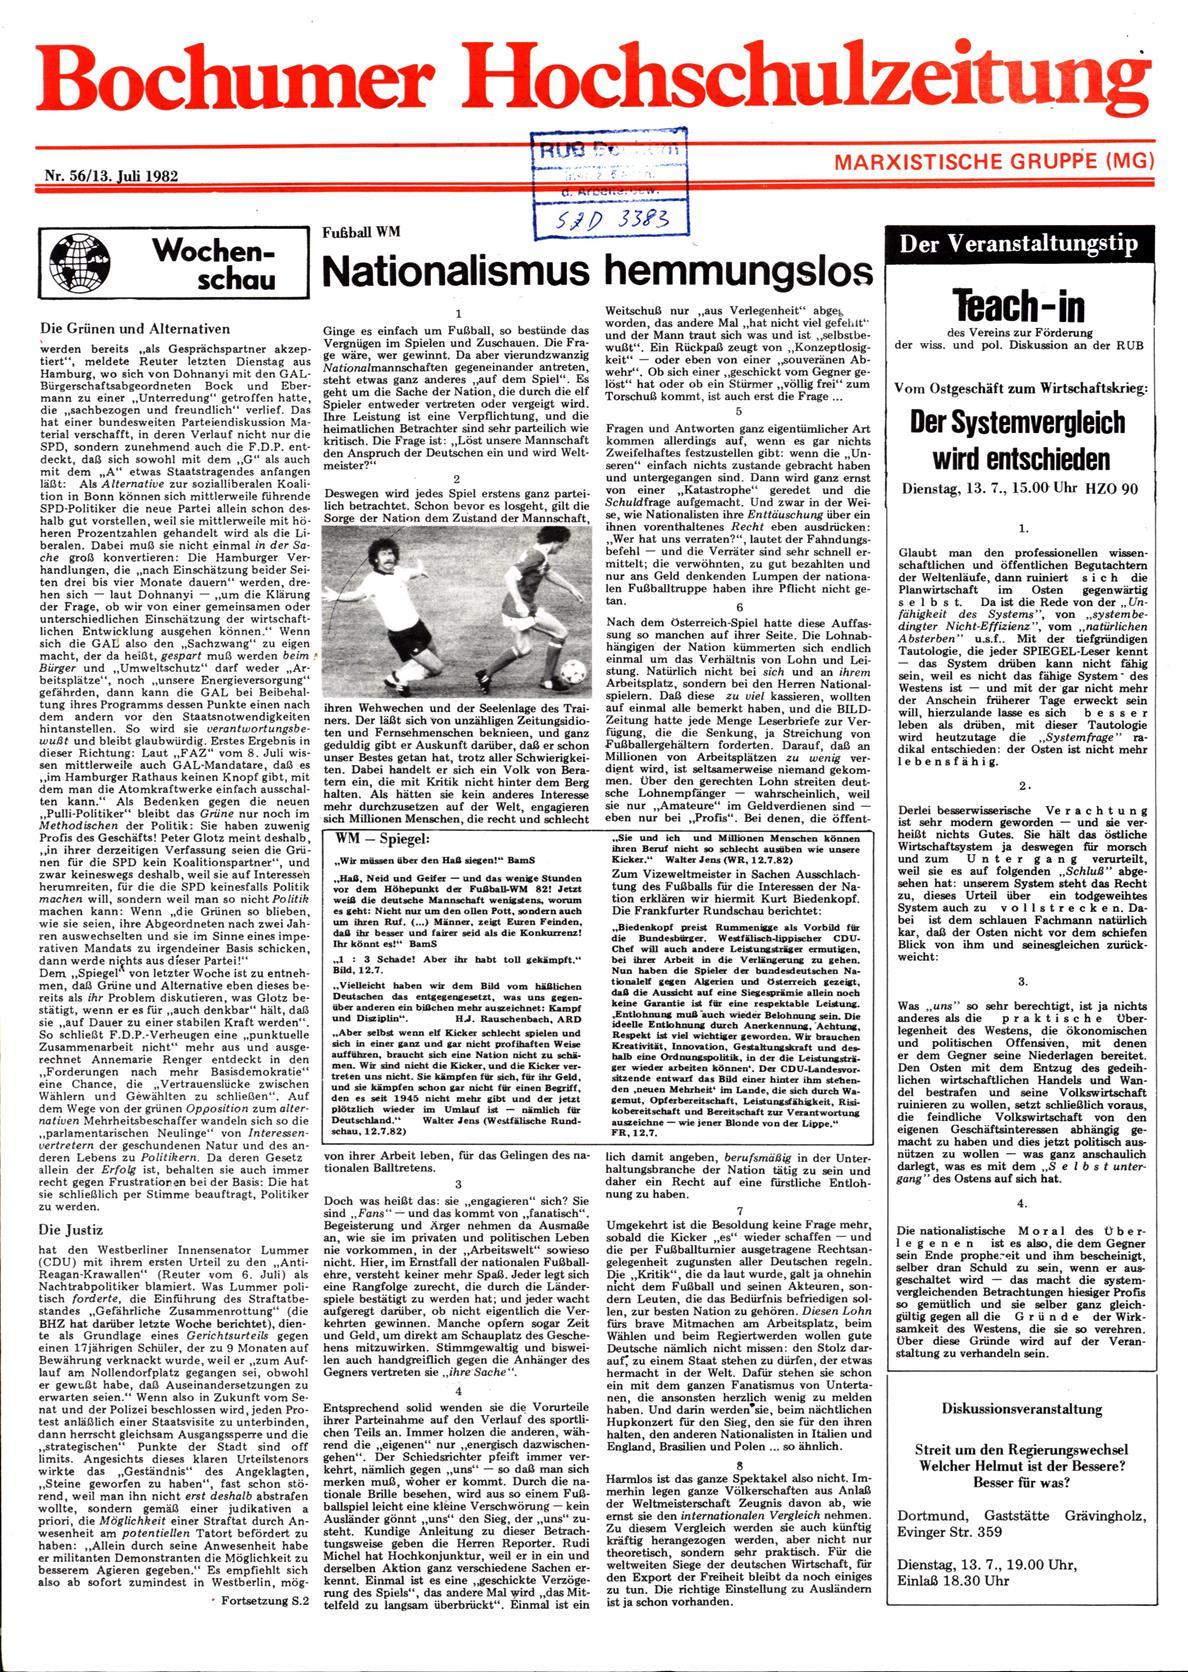 Bochum_BHZ_19820713_056_001